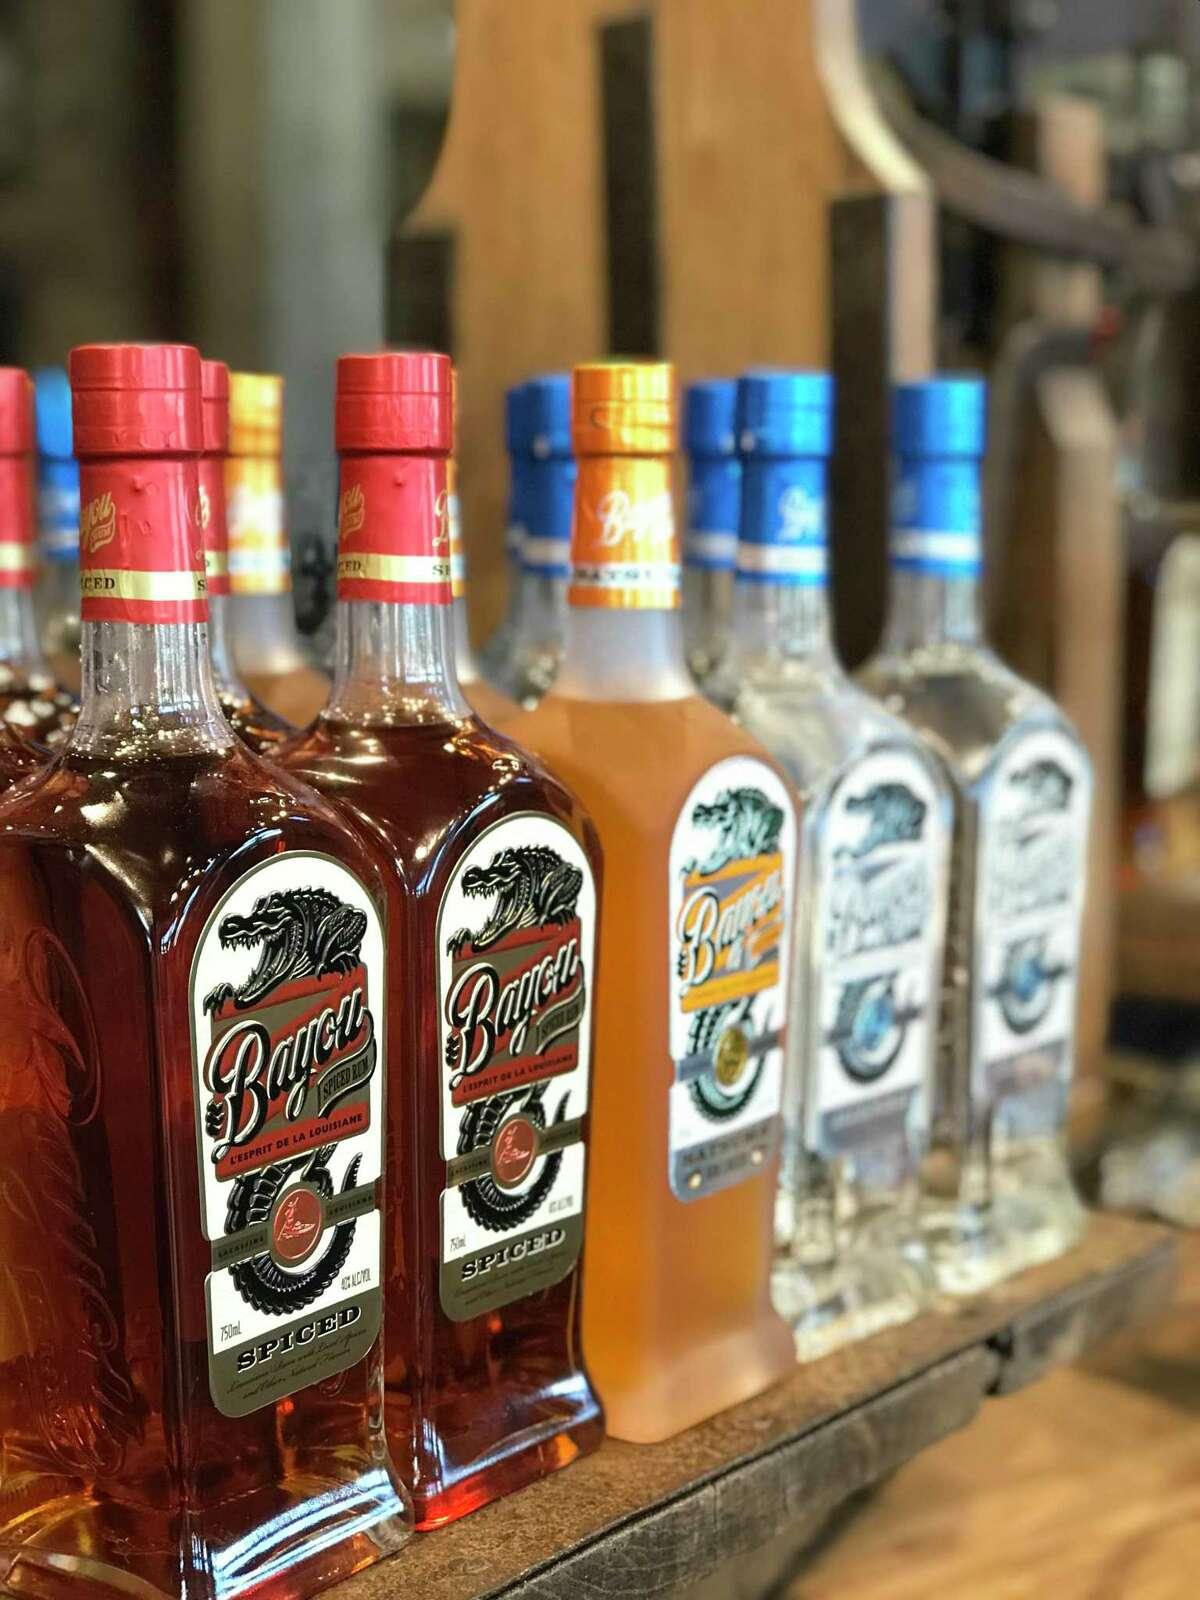 Louisiana Spirits Distillery in Lacassine, La., produces Bayou Rum, made from Louisiana sugarcane.